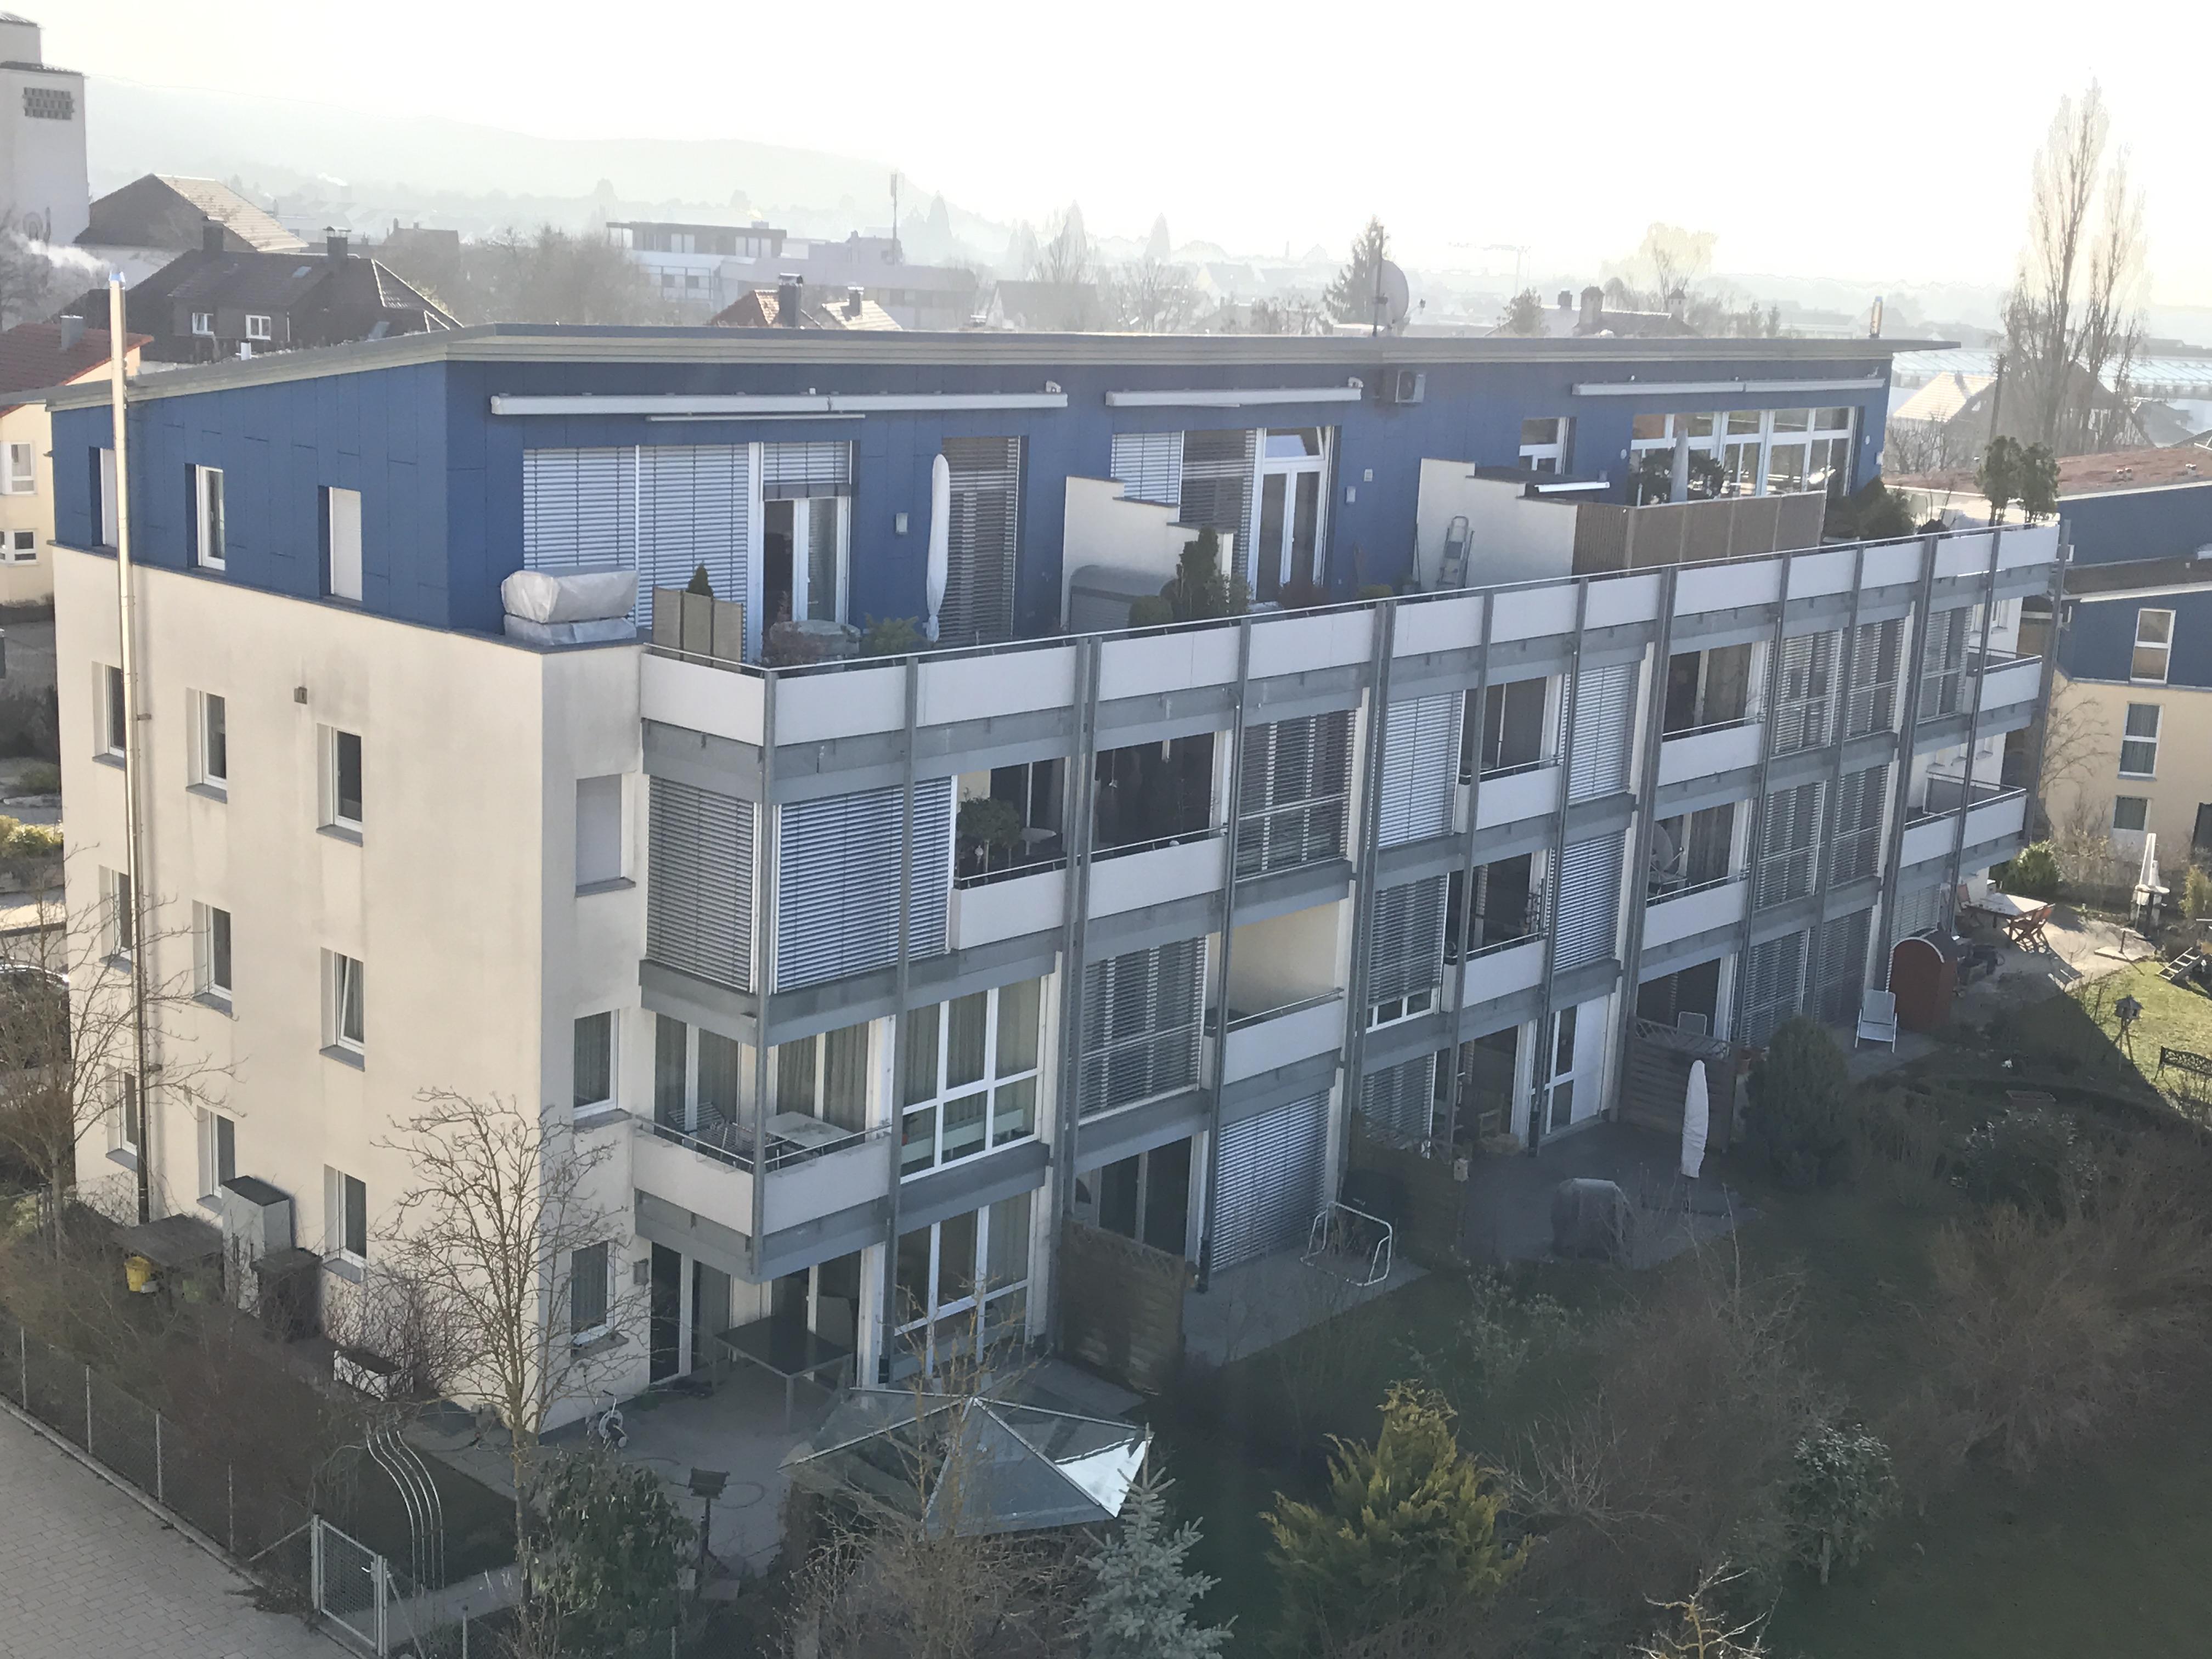 WEG Käthe-Kollwitz-Str. 3-9, Herrenberg